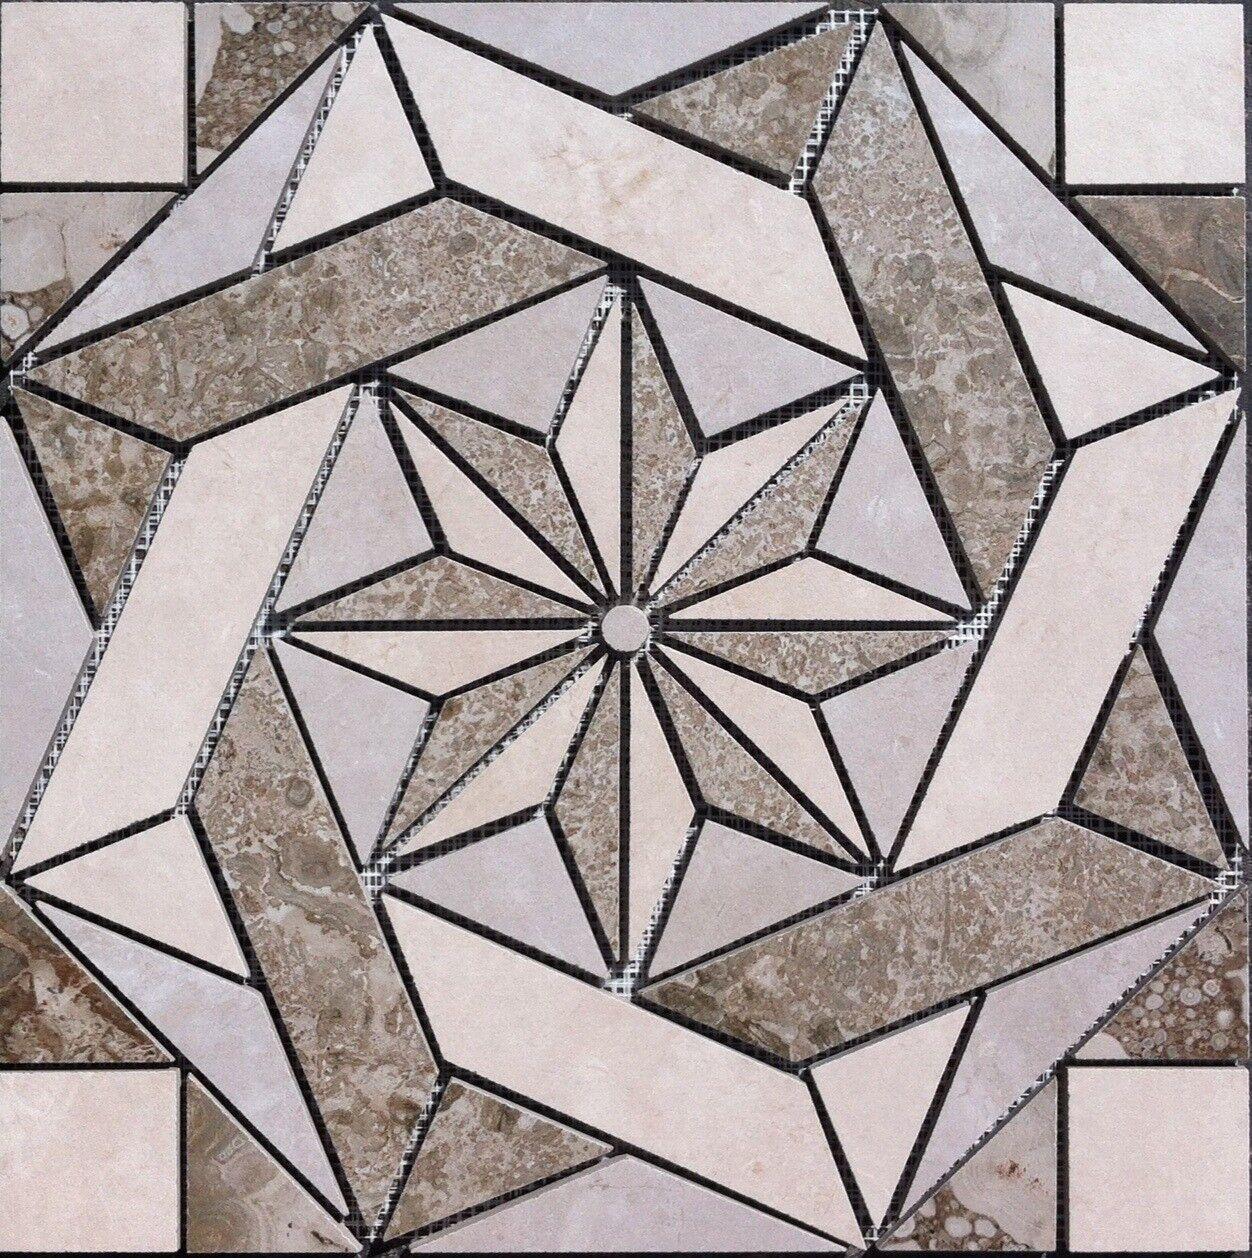 16 3 8  X 16 3 8  Tile Medallion - Daltile's Exquisite & Affinity tile series